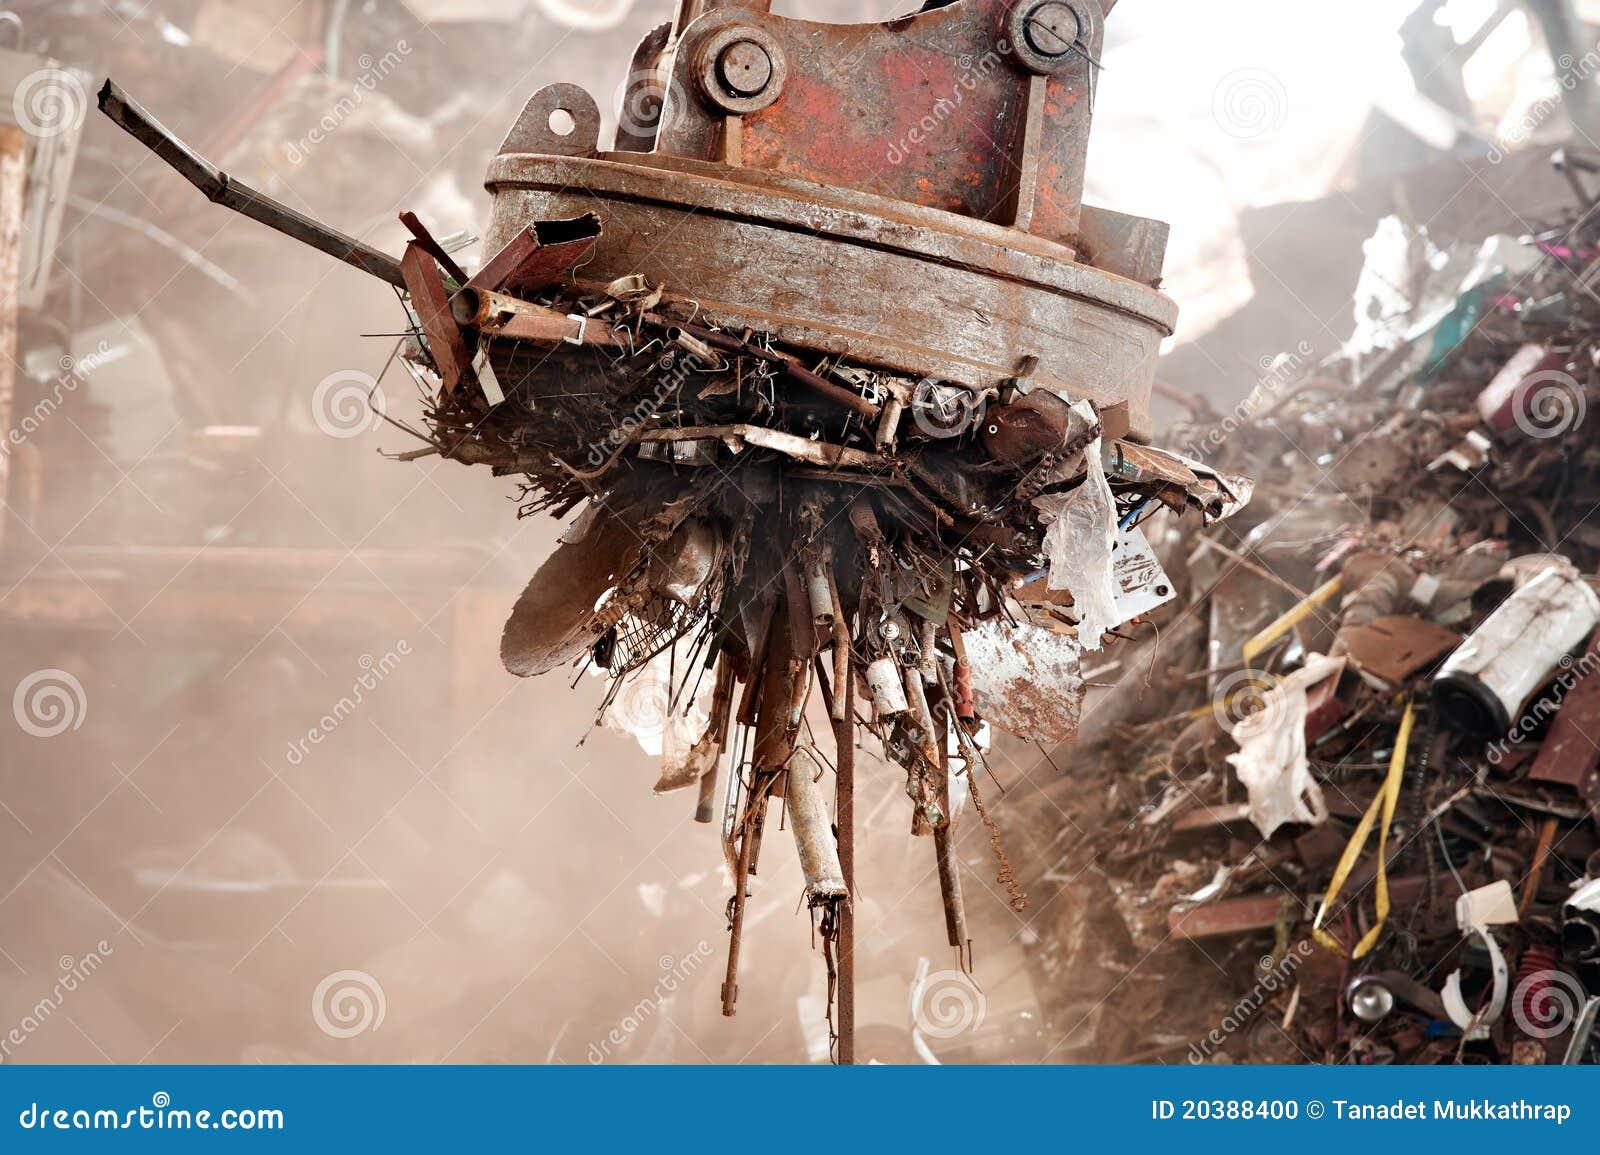 big magnet stock photo image of damaged junk environmental 20388400